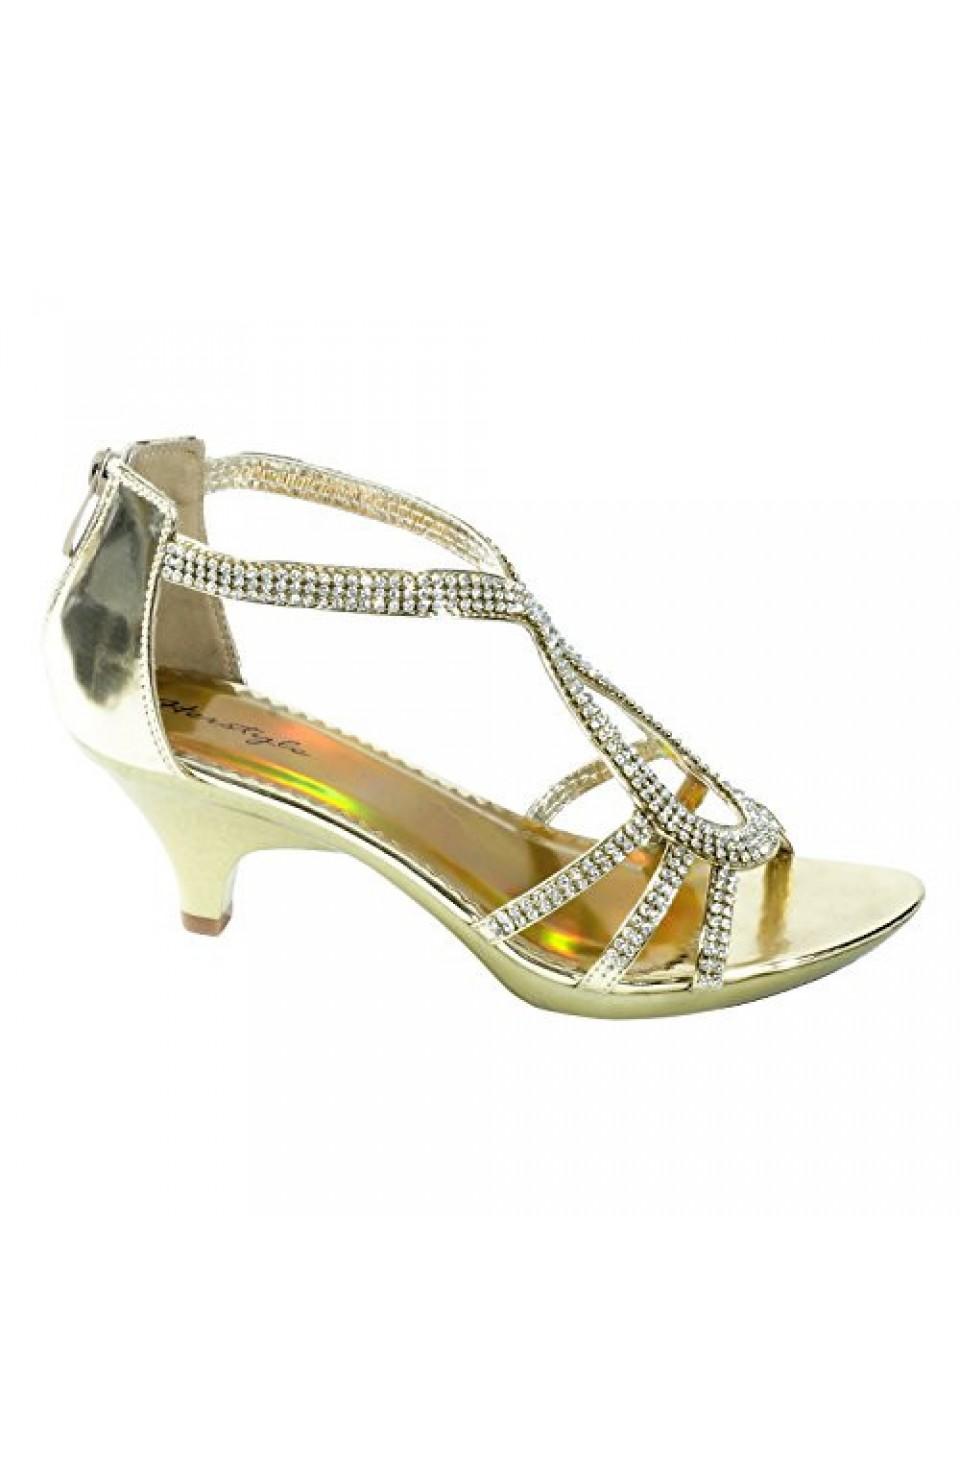 Women's Gold Manmade Maddyra Glowing Low-Heeled Sandal with Rhinestone Straps